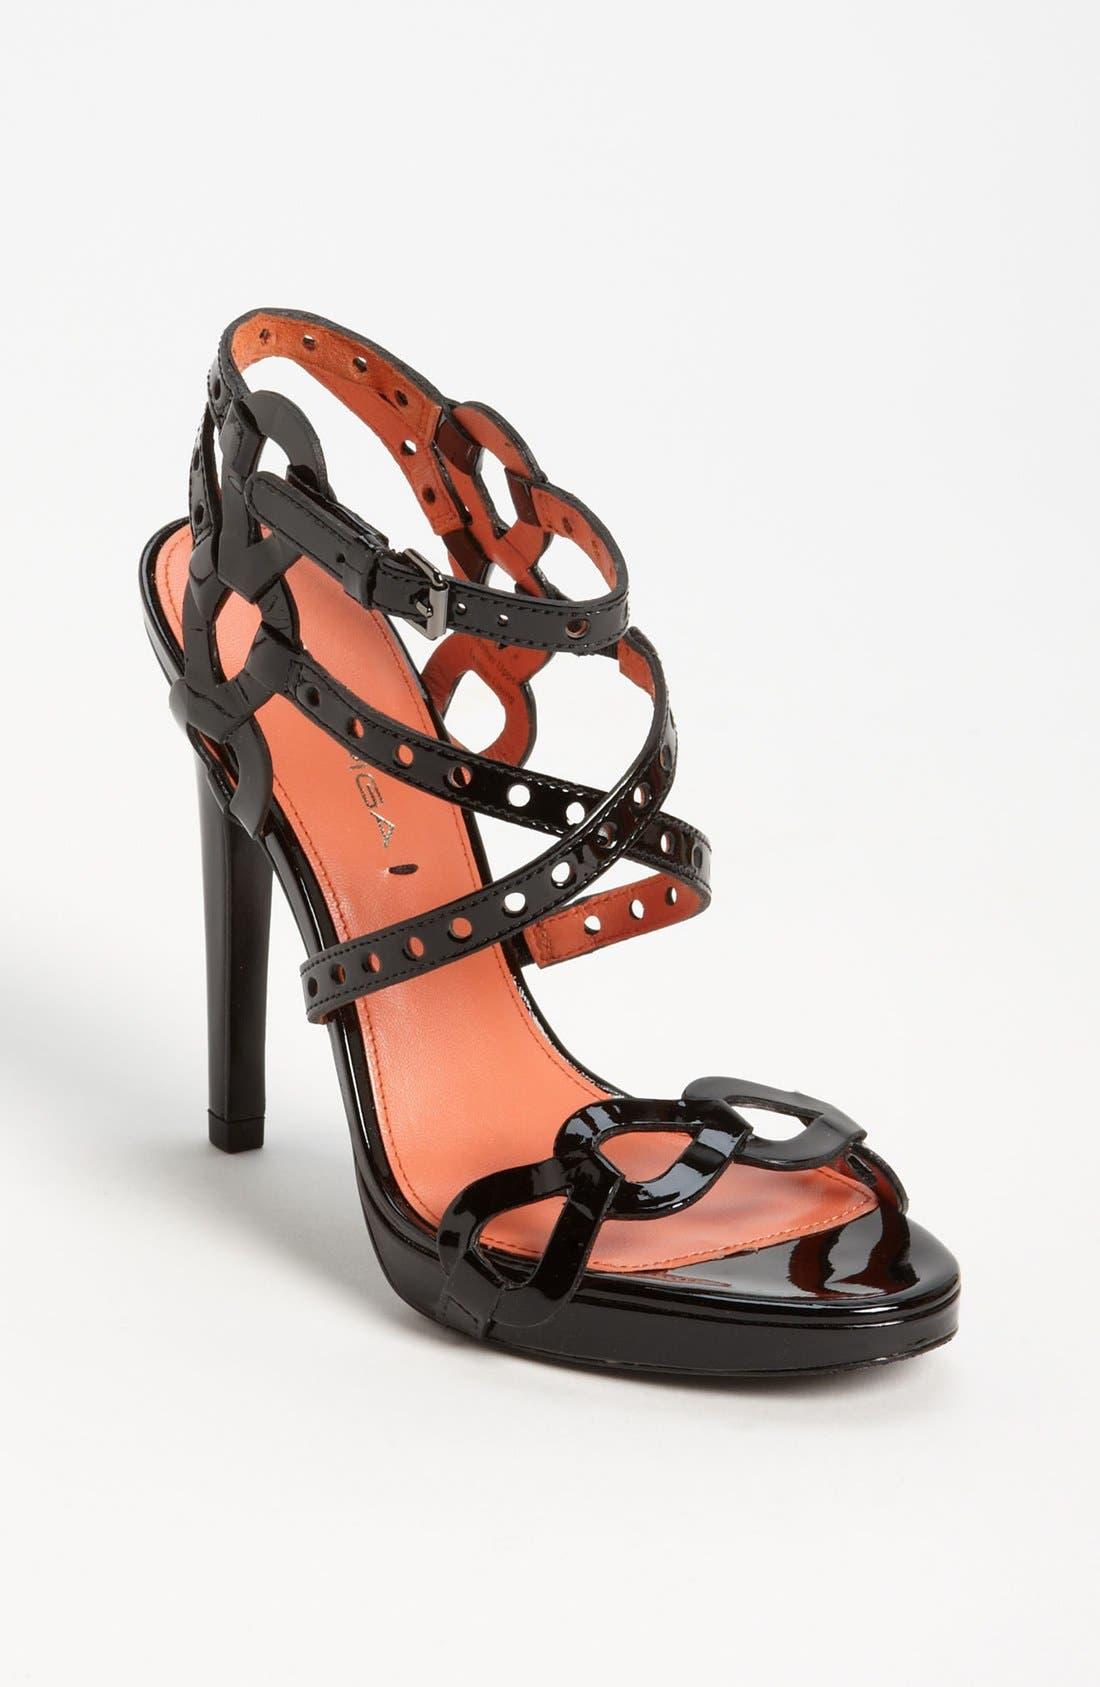 Main Image - Via Spiga 'Pacifica' Sandal